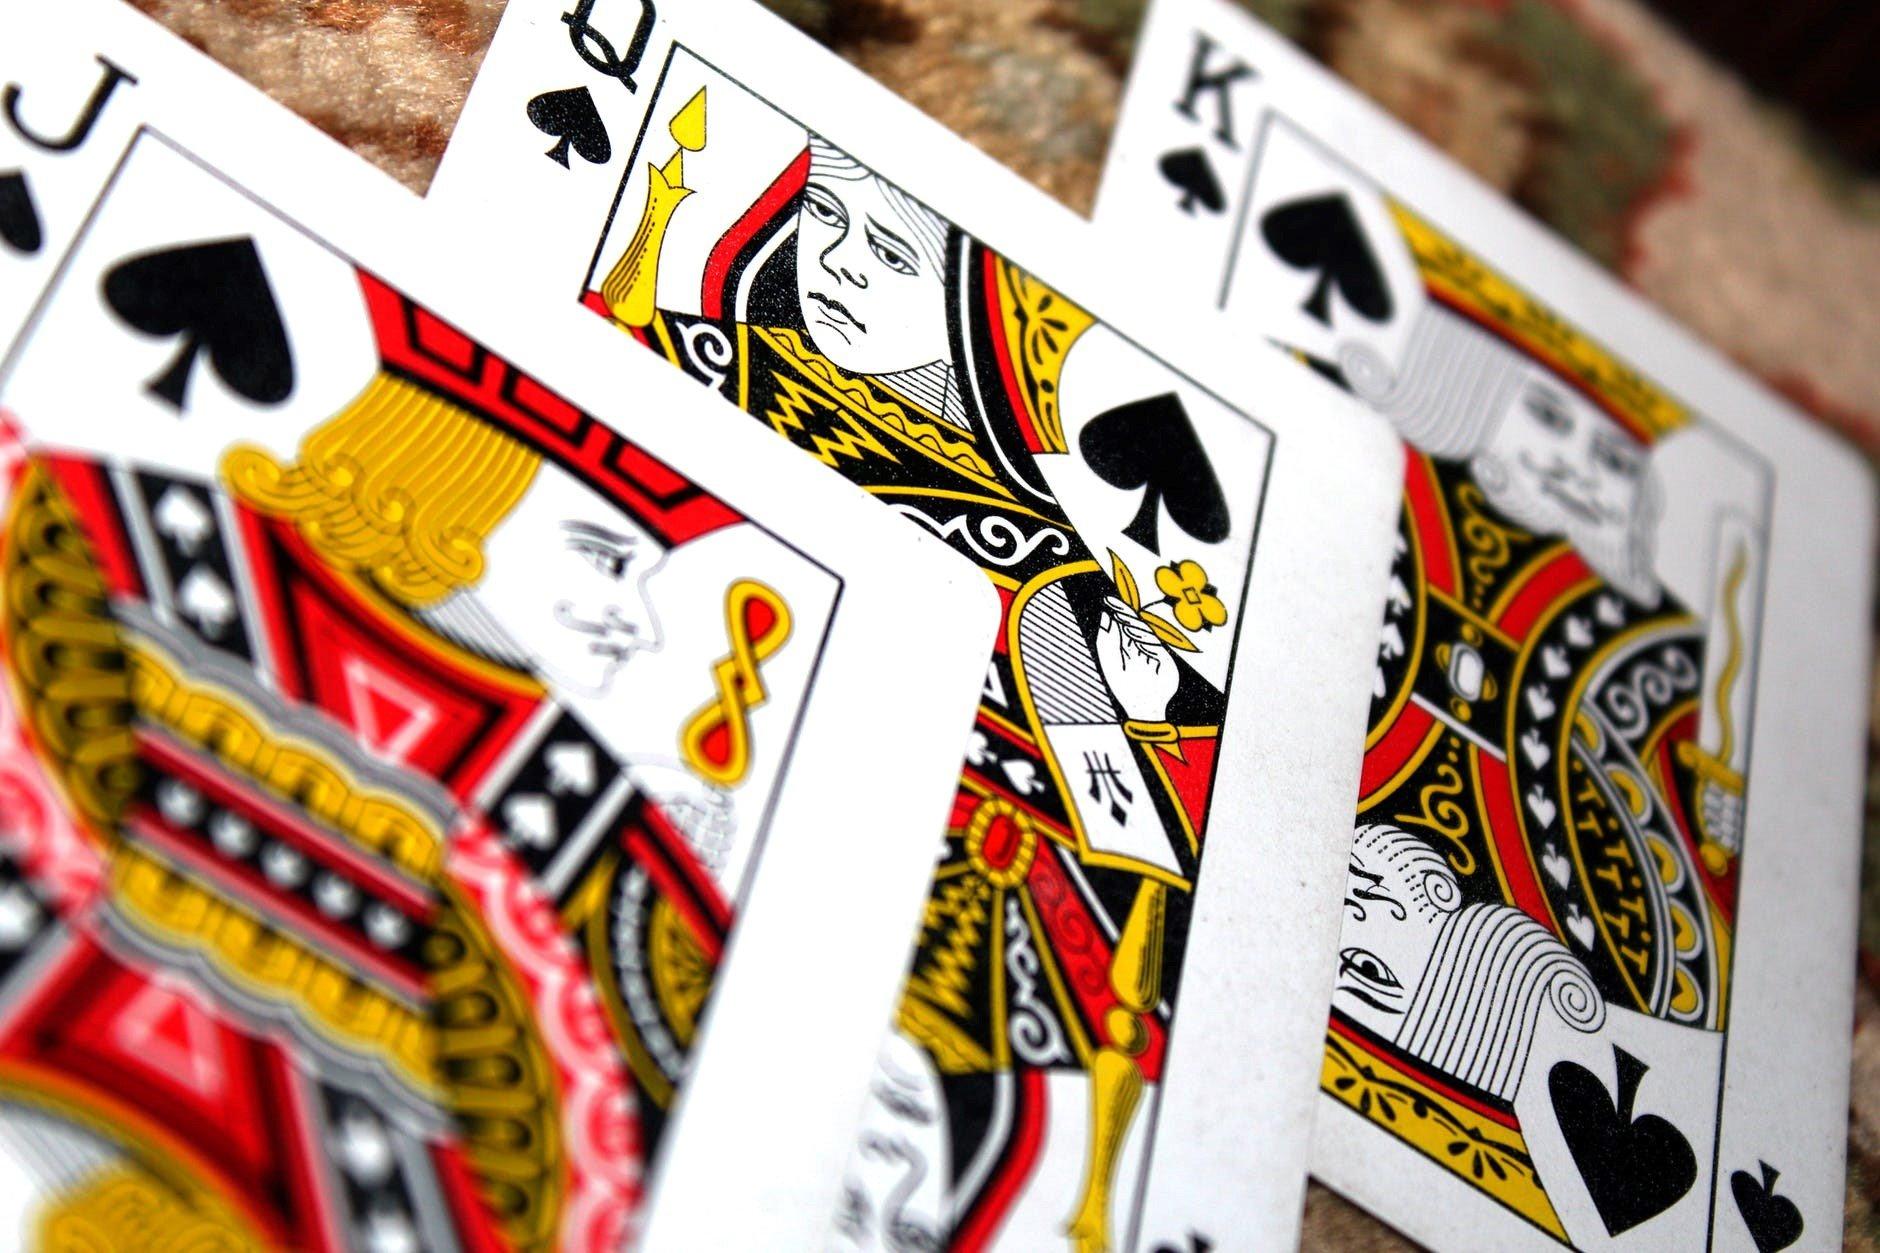 poker3 - More California Poker Players Opting For Nevada